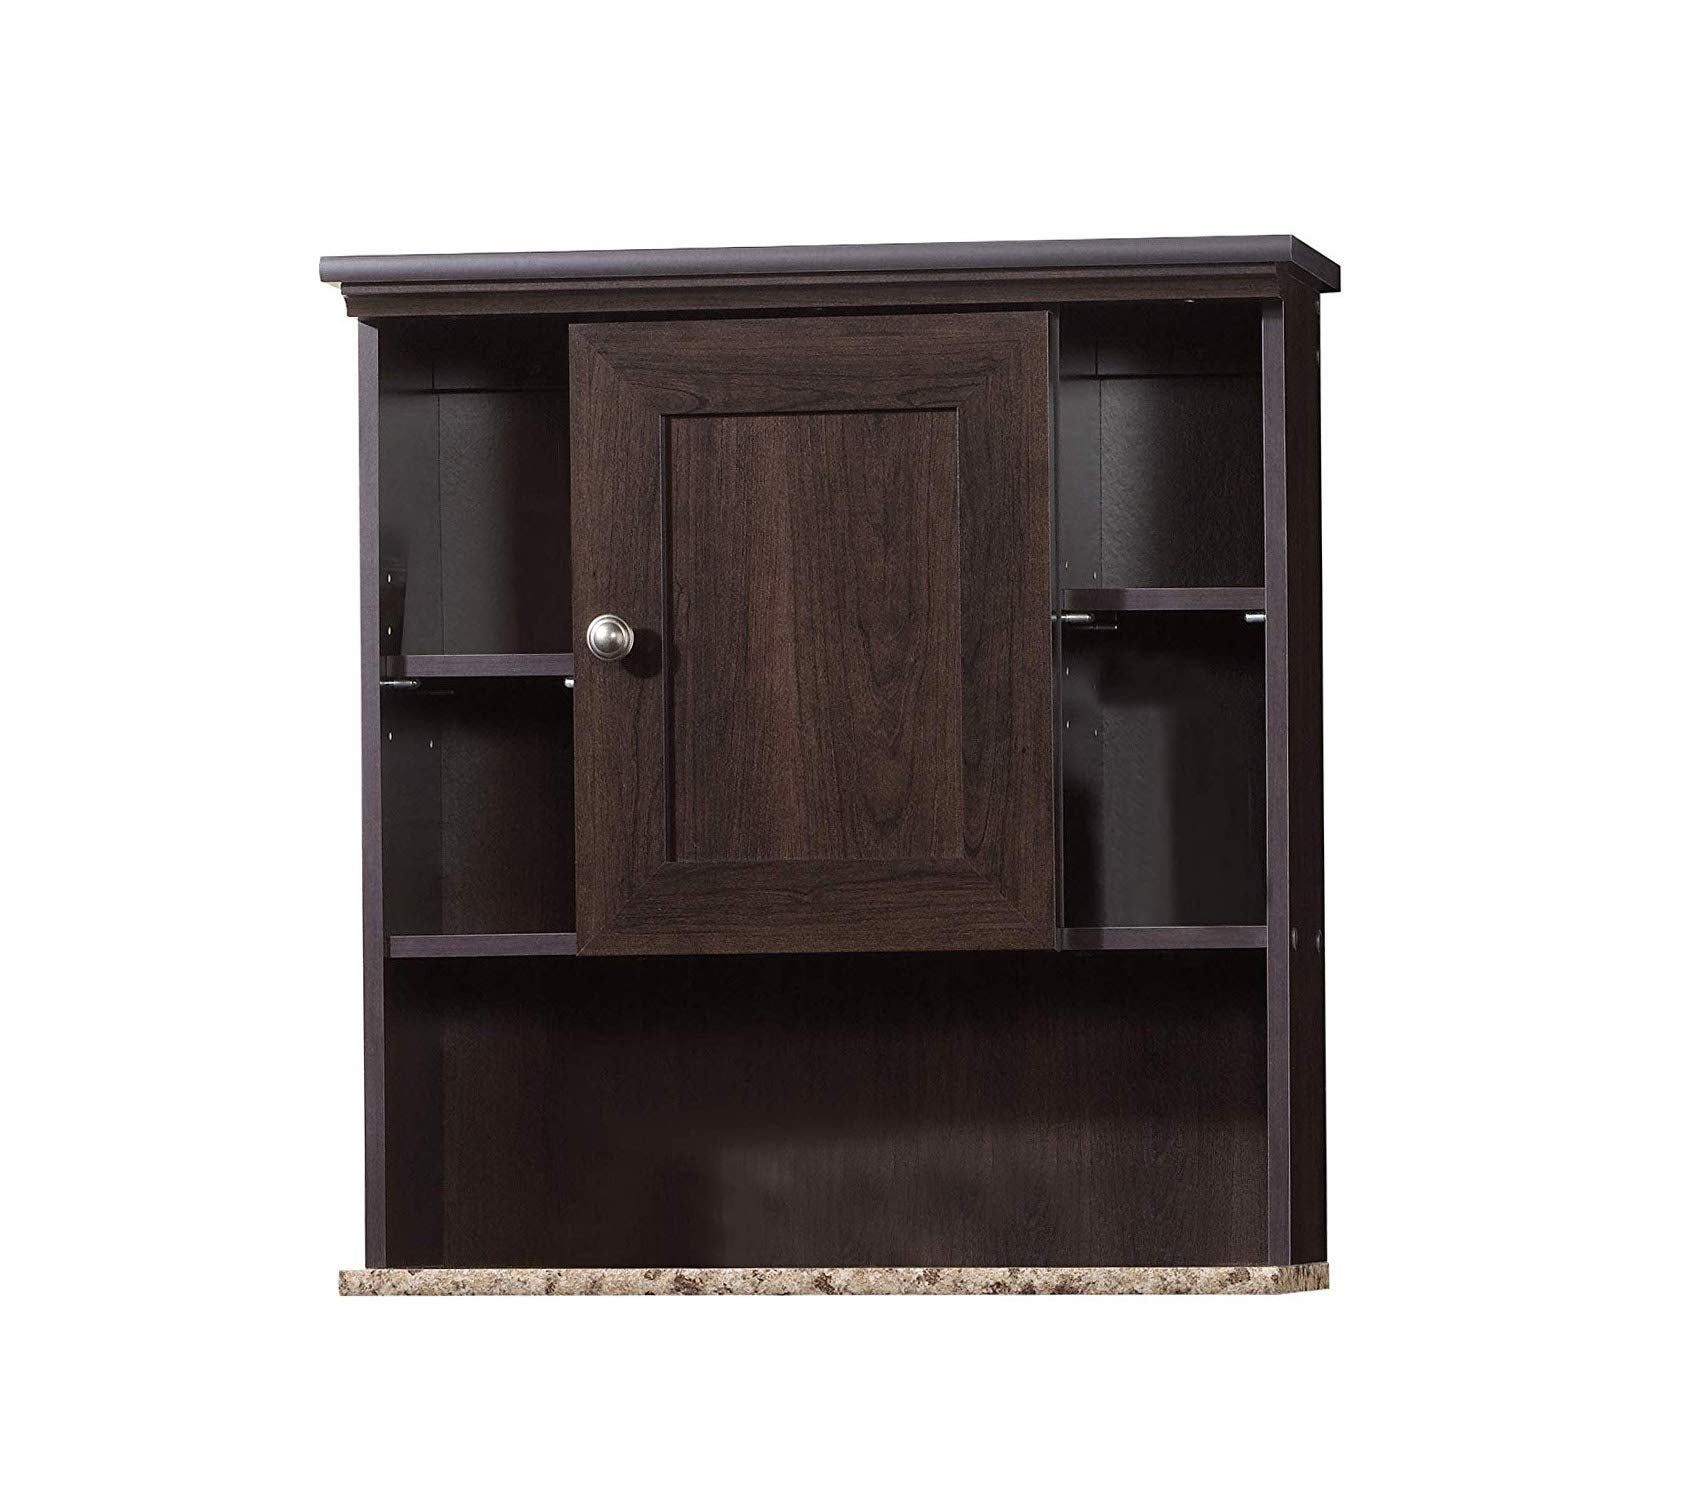 Sаudеr Premium Peppercorn Wall Cabinet L: 23.31'' x W: 7.56'' x H: 24.57'' Cinnamon Cherry Storage